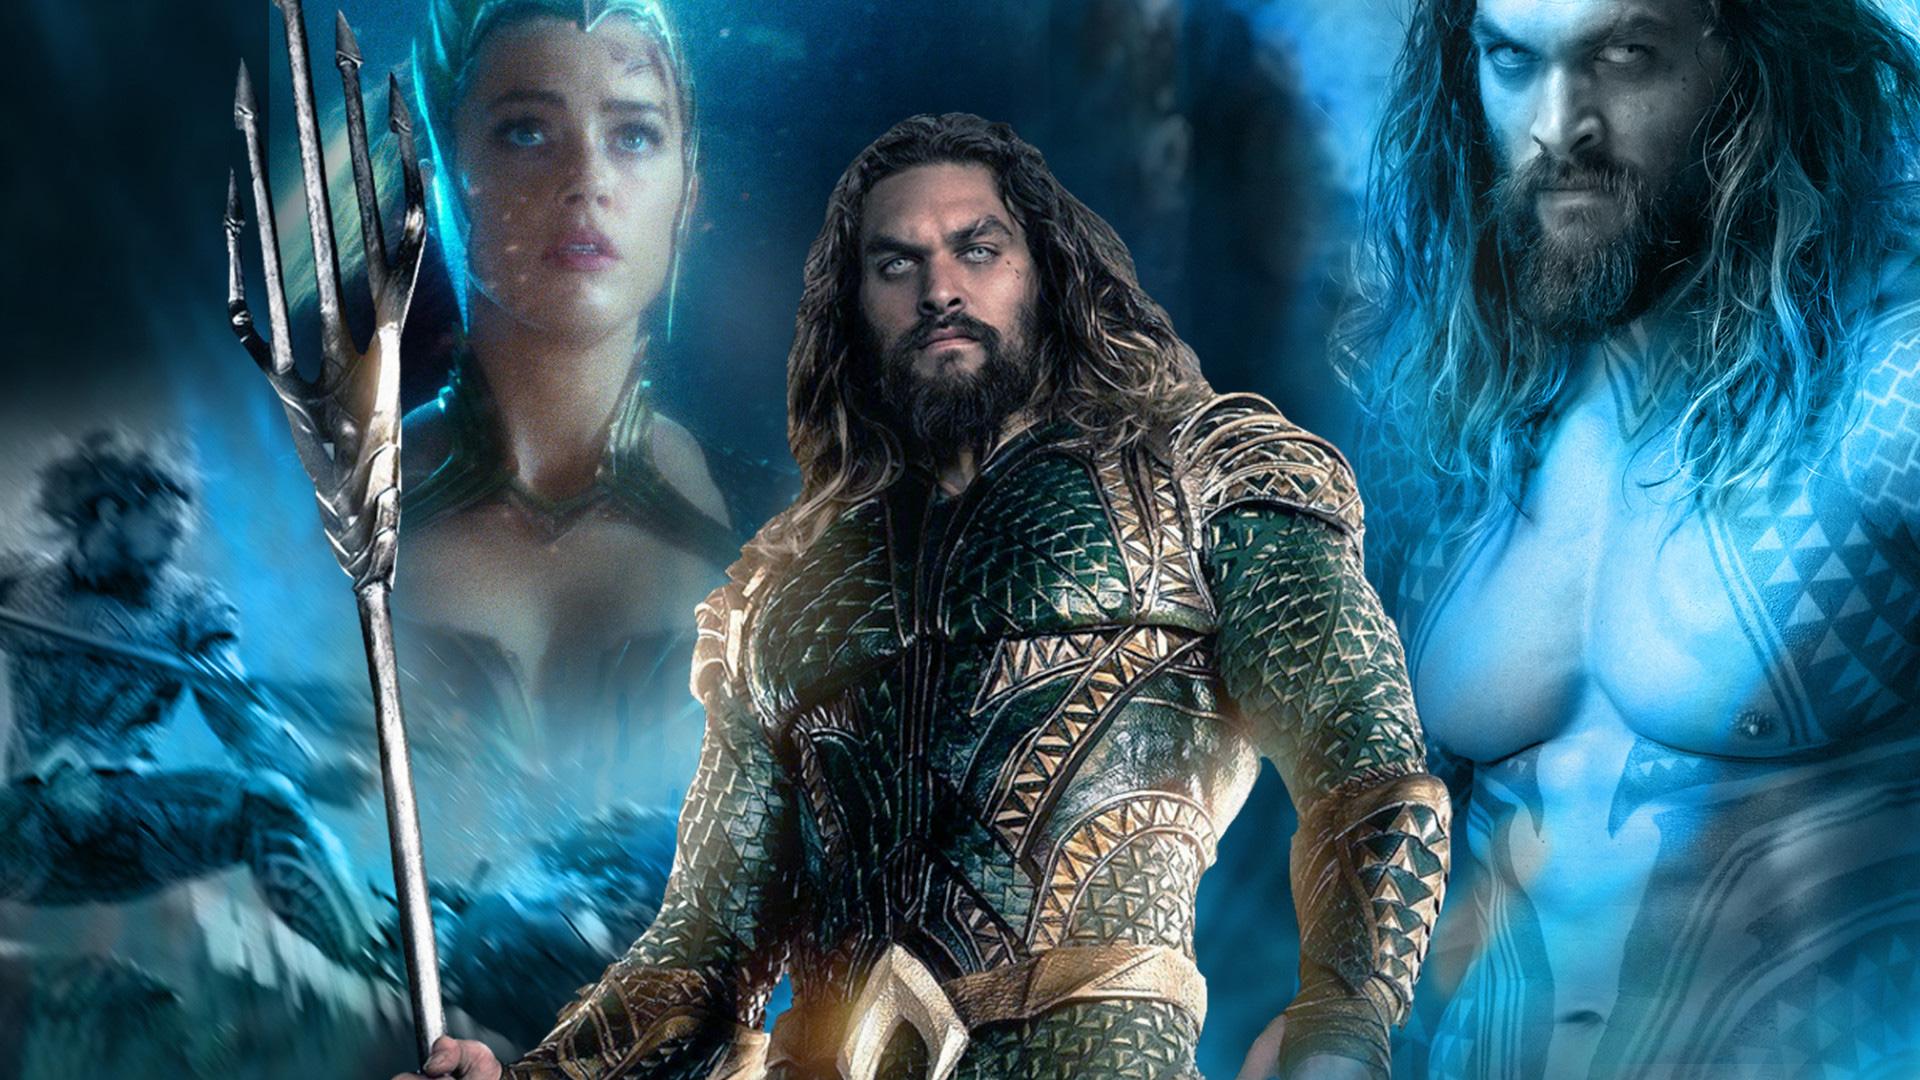 Aquaman 2018 movie poster hd movies 4k wallpapers - Movie poster wallpaper ...